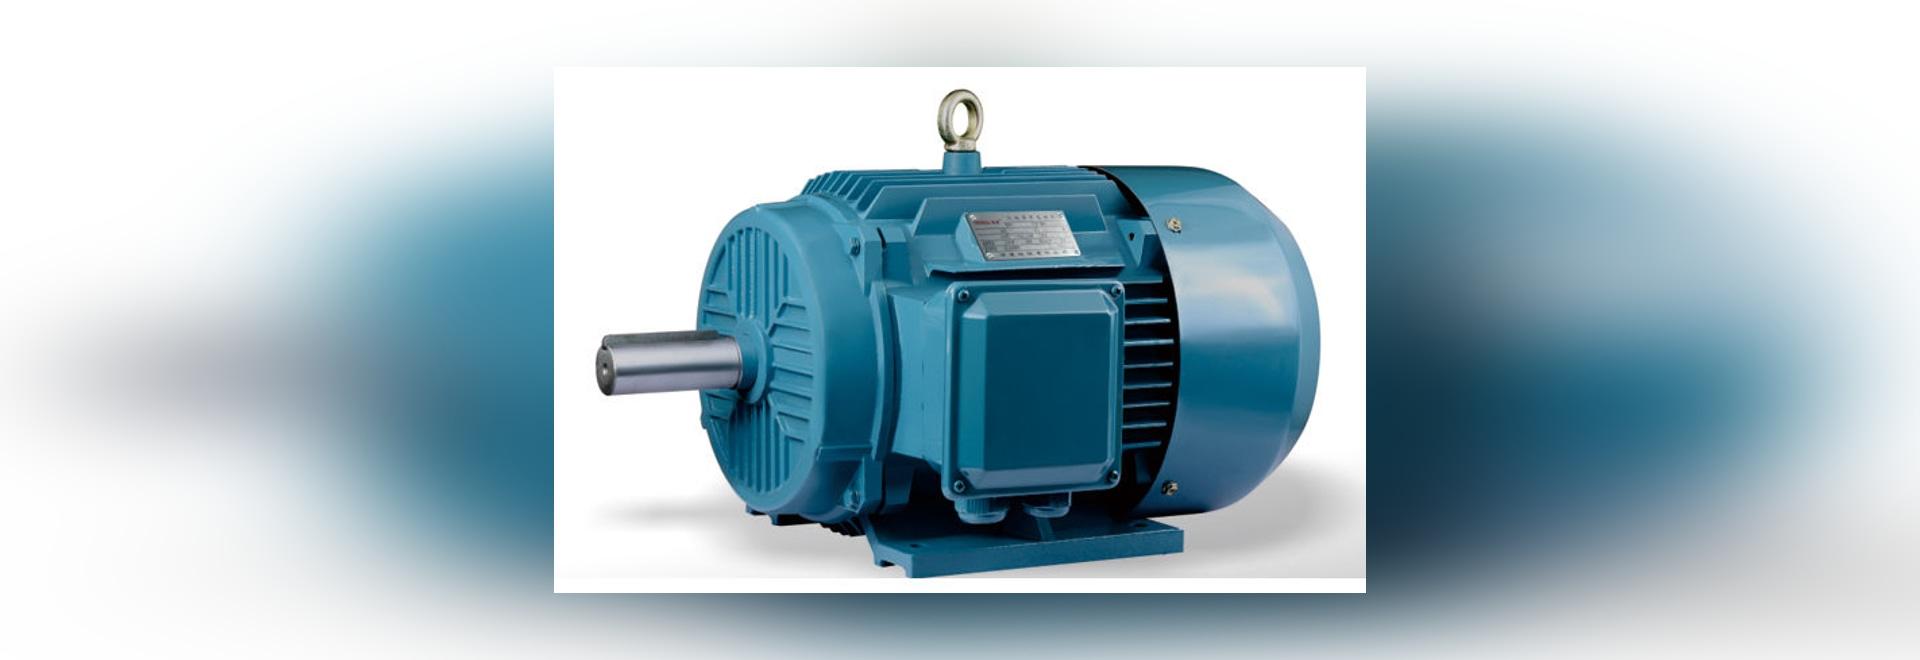 NEW: three-phase motor by Hengsu Holdings Co,.Ltd. - Hengsu Holdings ...